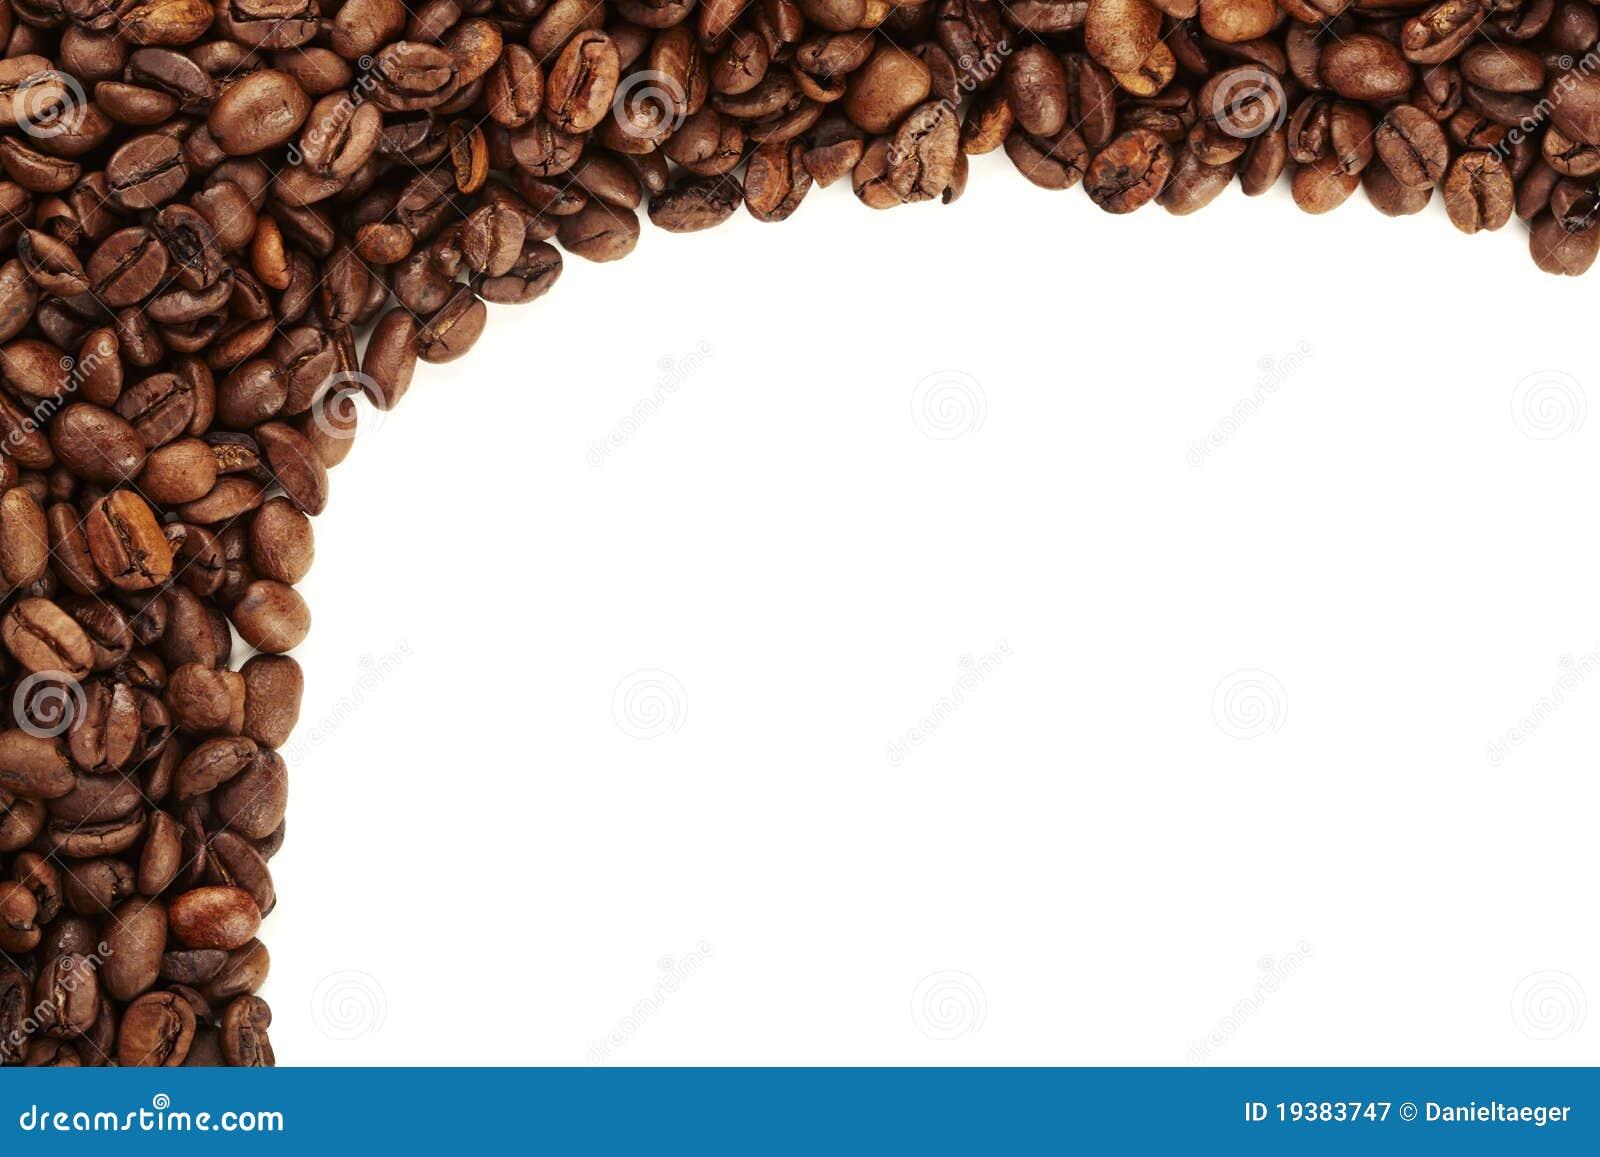 Coffee Bean Border ~ Coffee bean border stock image of background edged